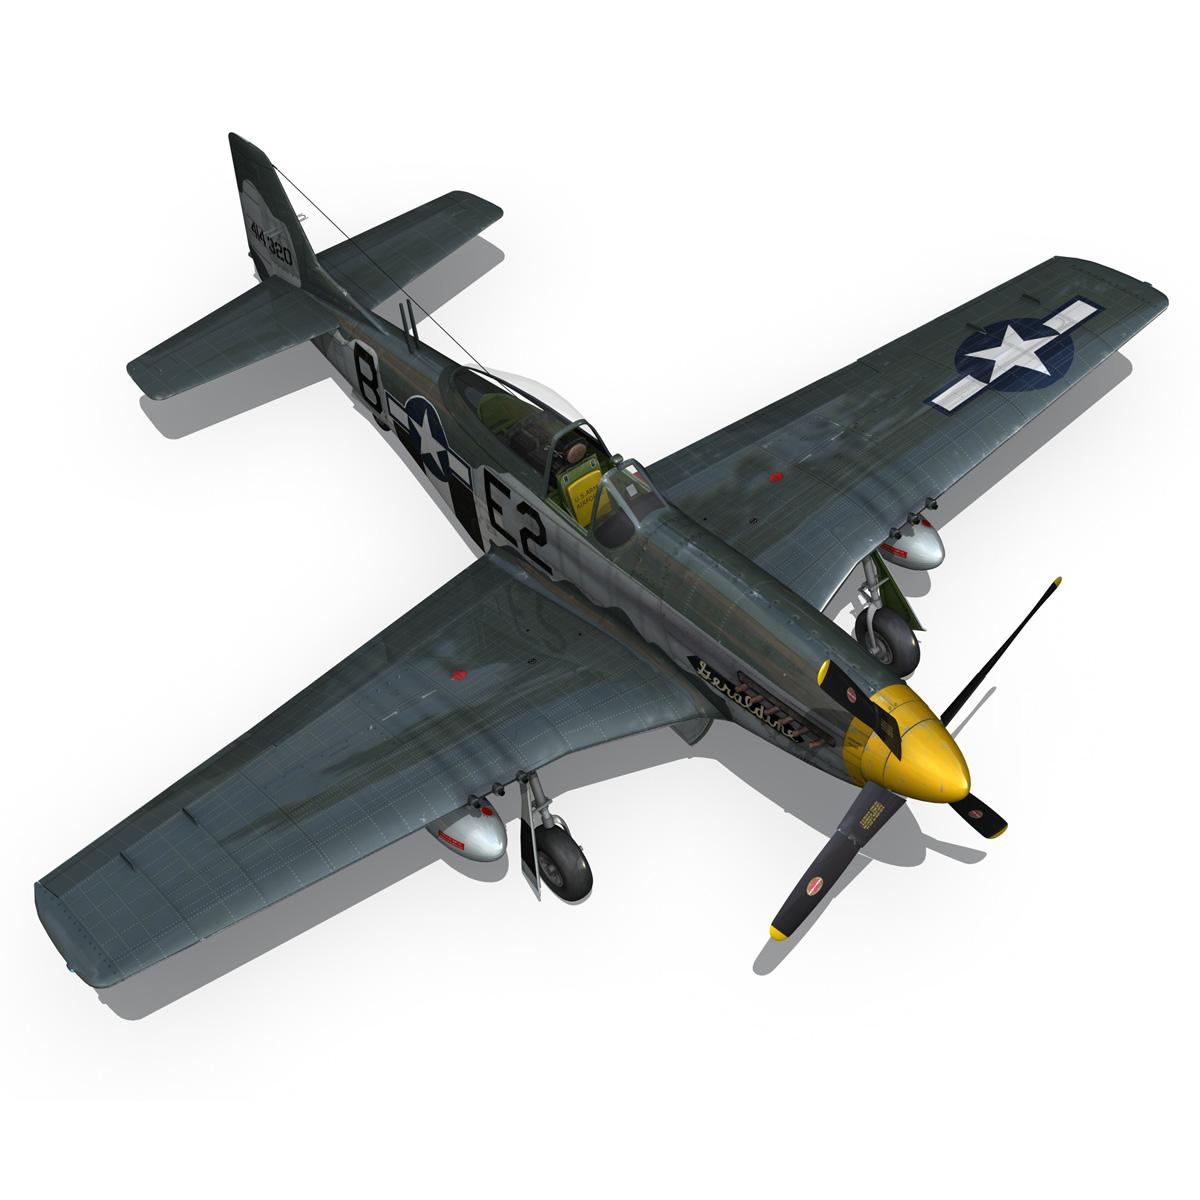 North American P-51D - Geraldine 3d model fbx c4d lwo obj 265950